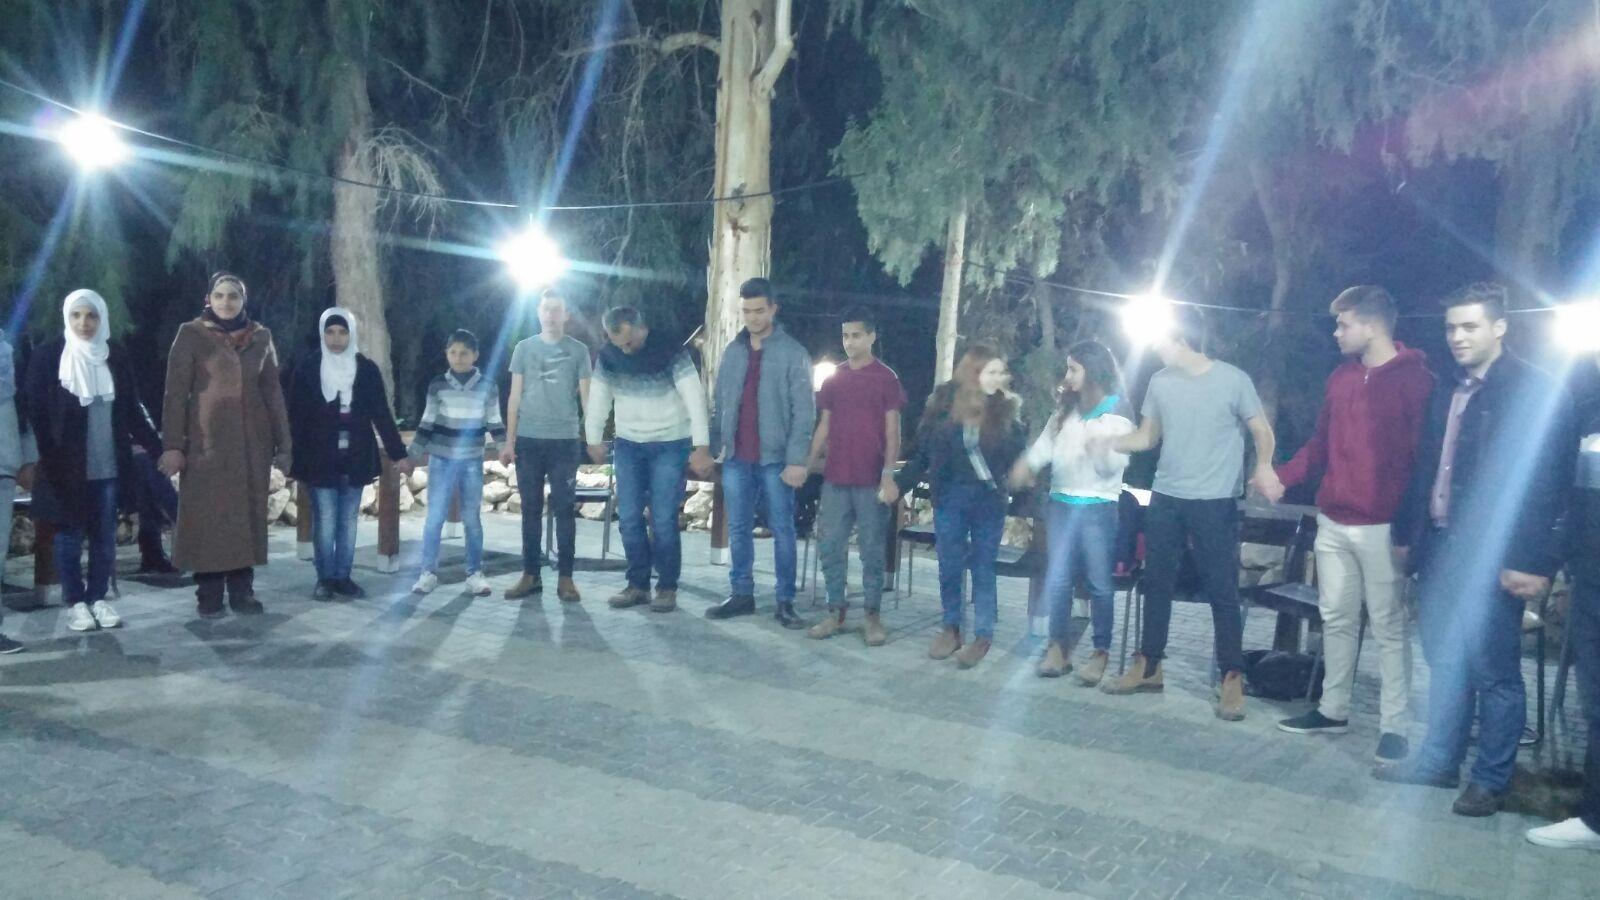 Youth camp night activity